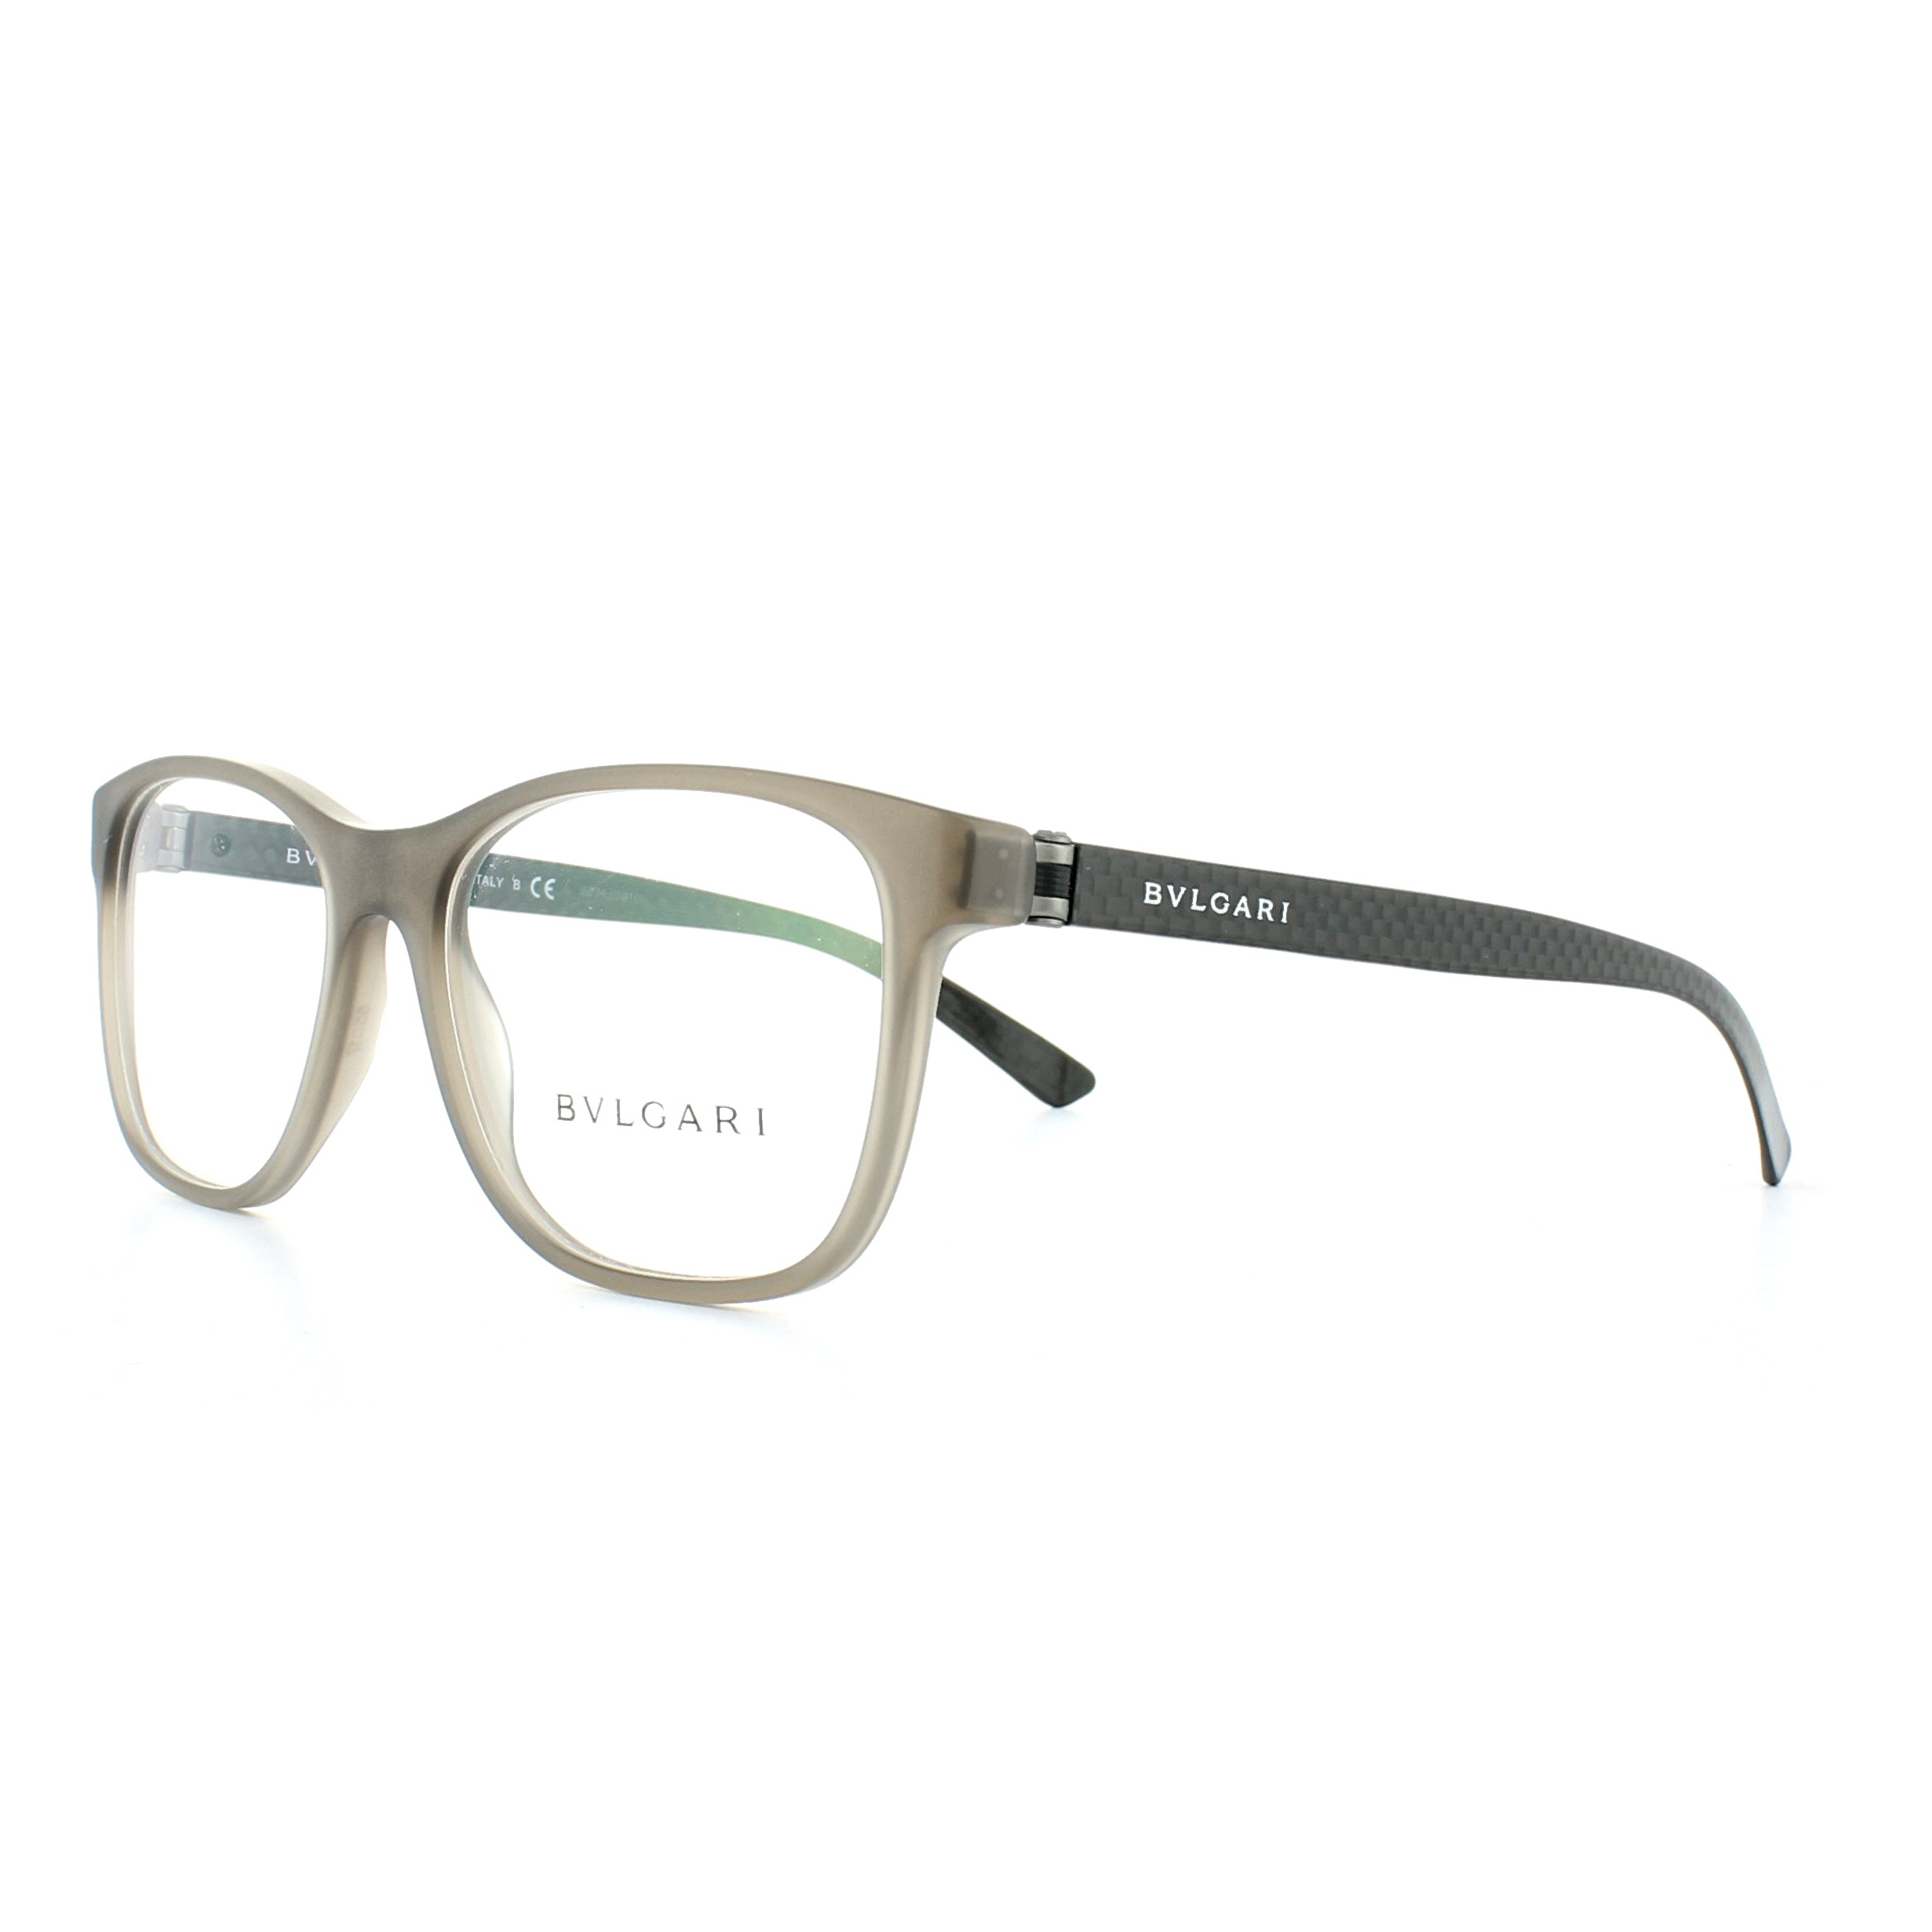 caafaa19c9 Bvlgari Glasses Frames 3036 5262 Grey 53mm Mens Womens 8053672811957 ...